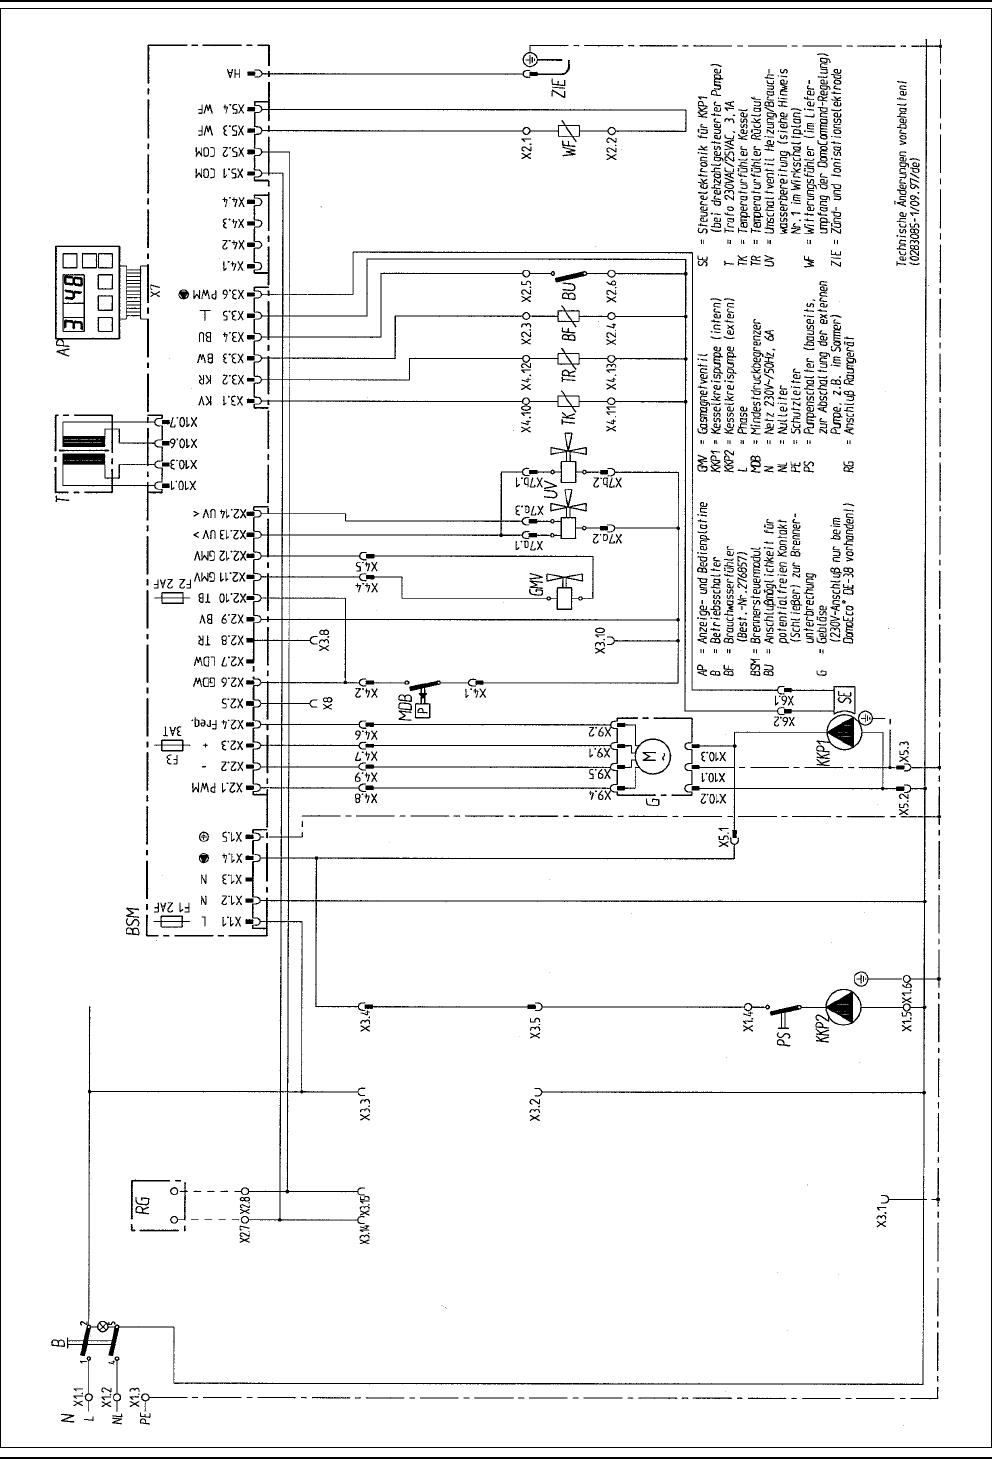 Großzügig 1968 Camaro Horn Schaltplan Ideen - Schaltplan Serie ...